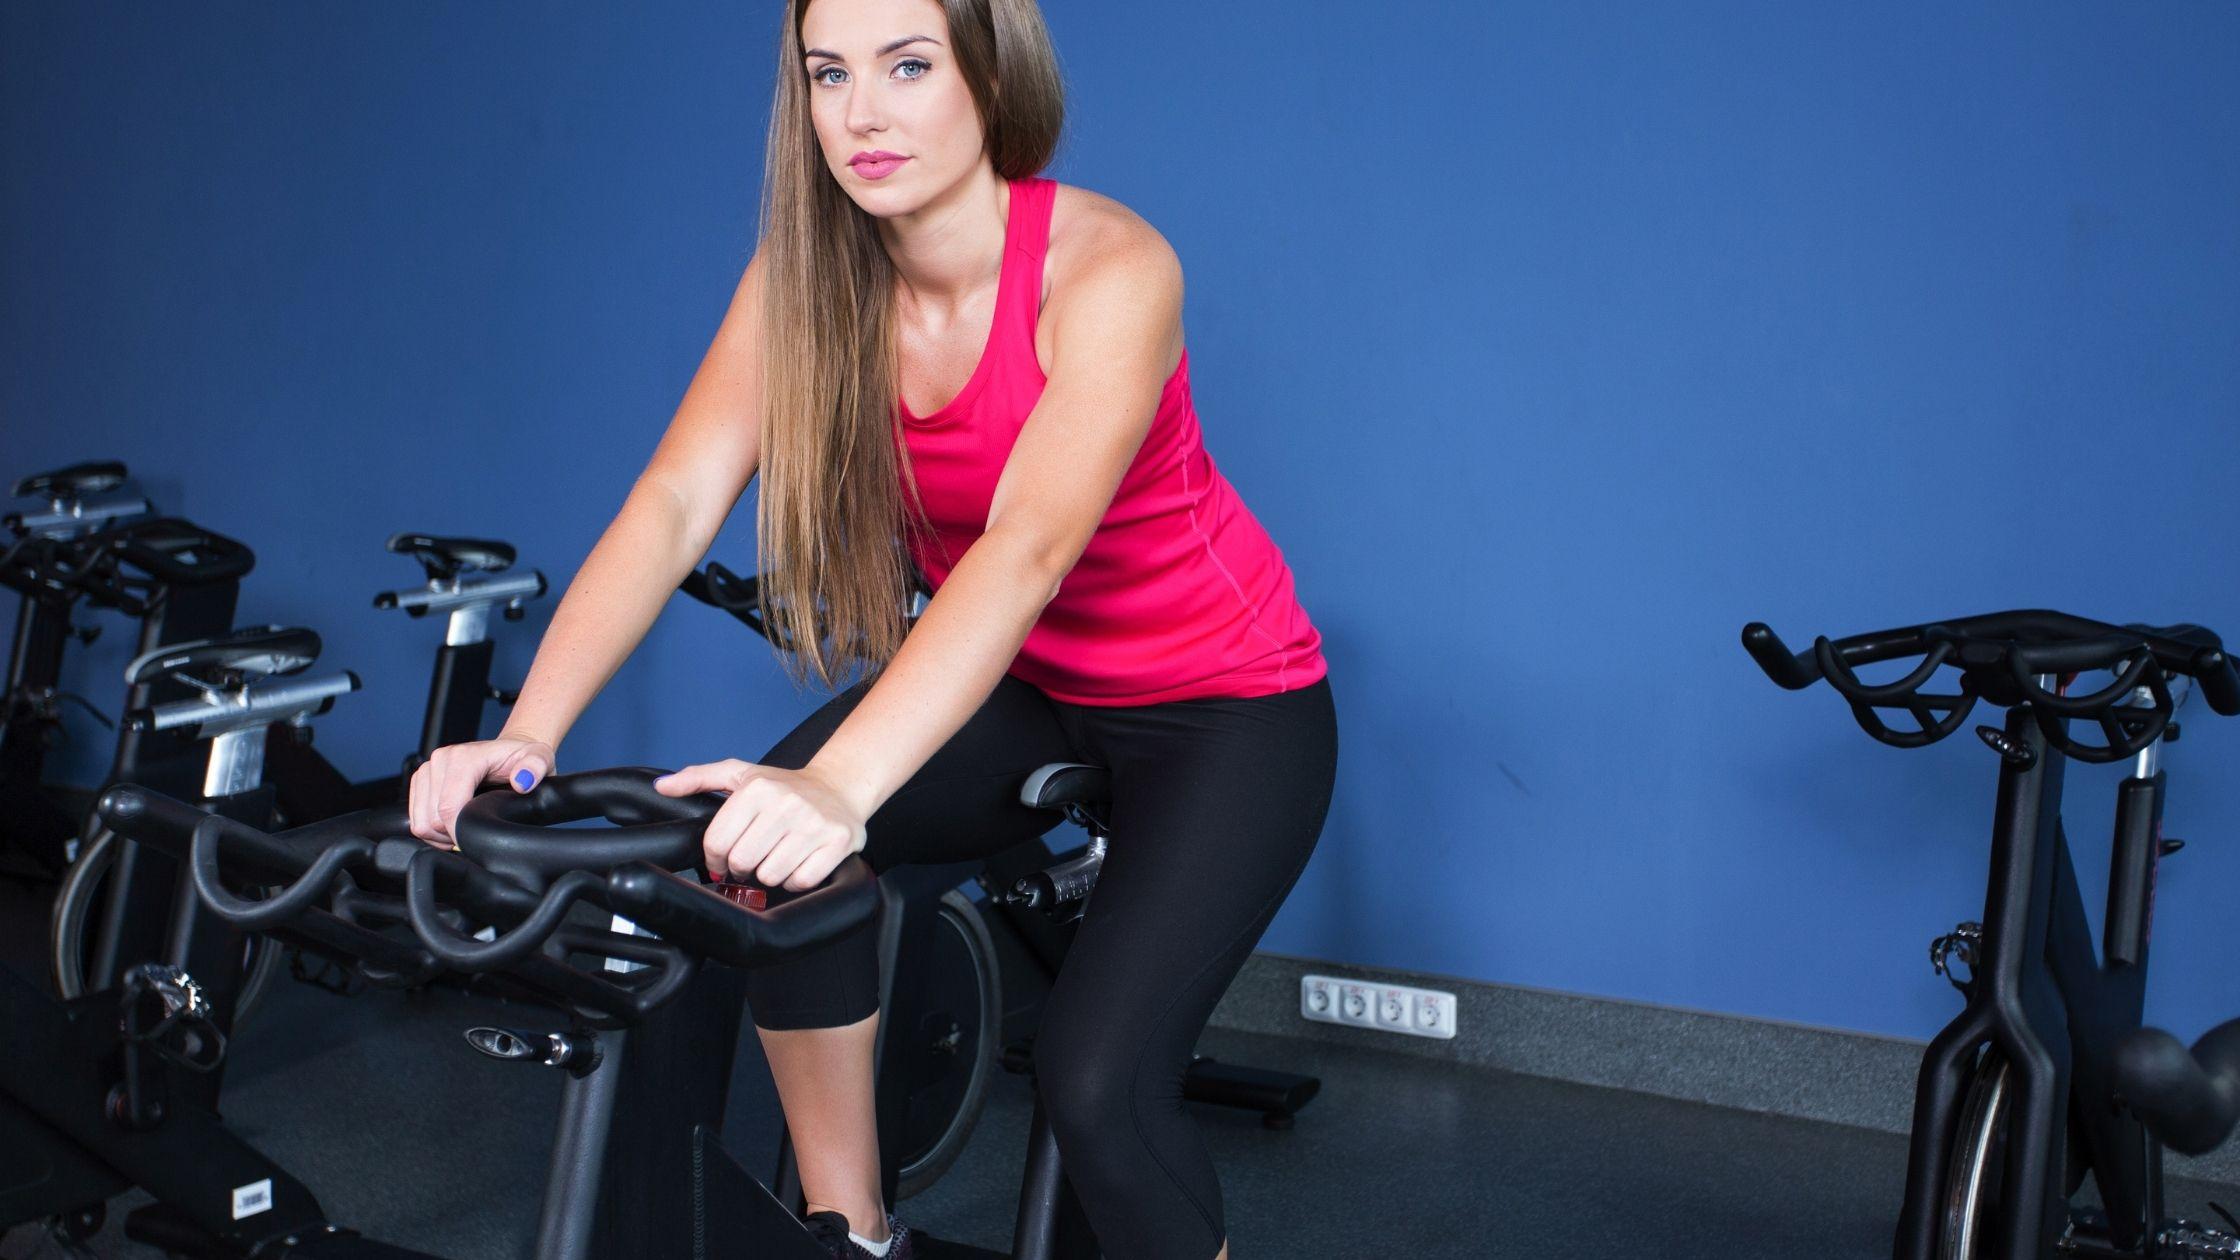 types of Exercise bikes: Indoor Exercise Bikes